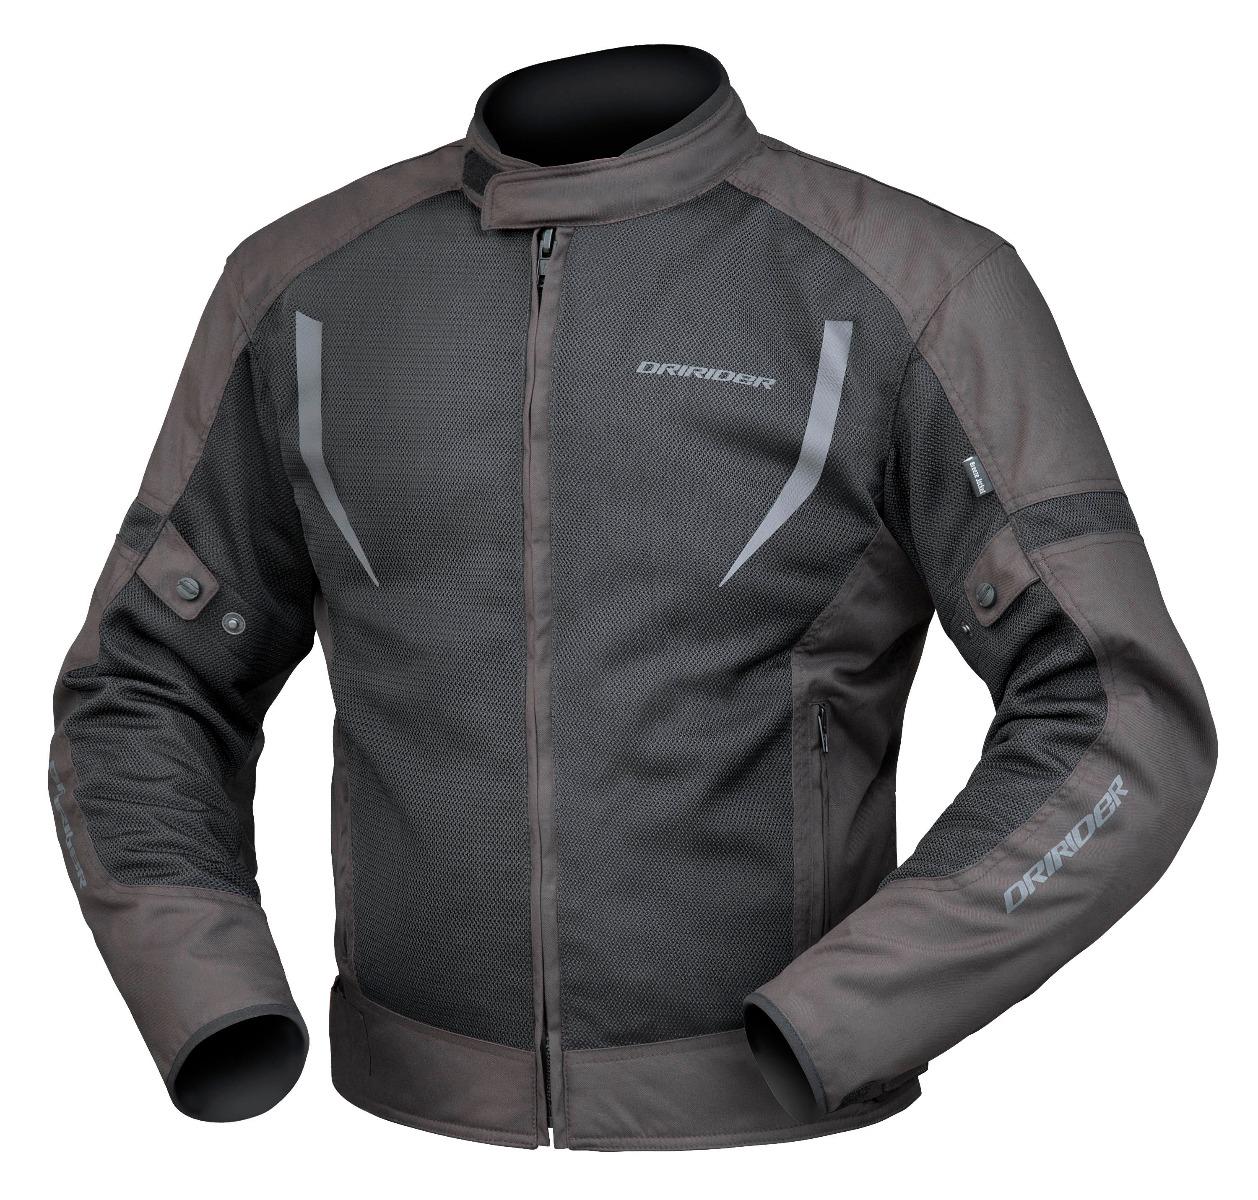 Dririder Breeze Mocha Jacket